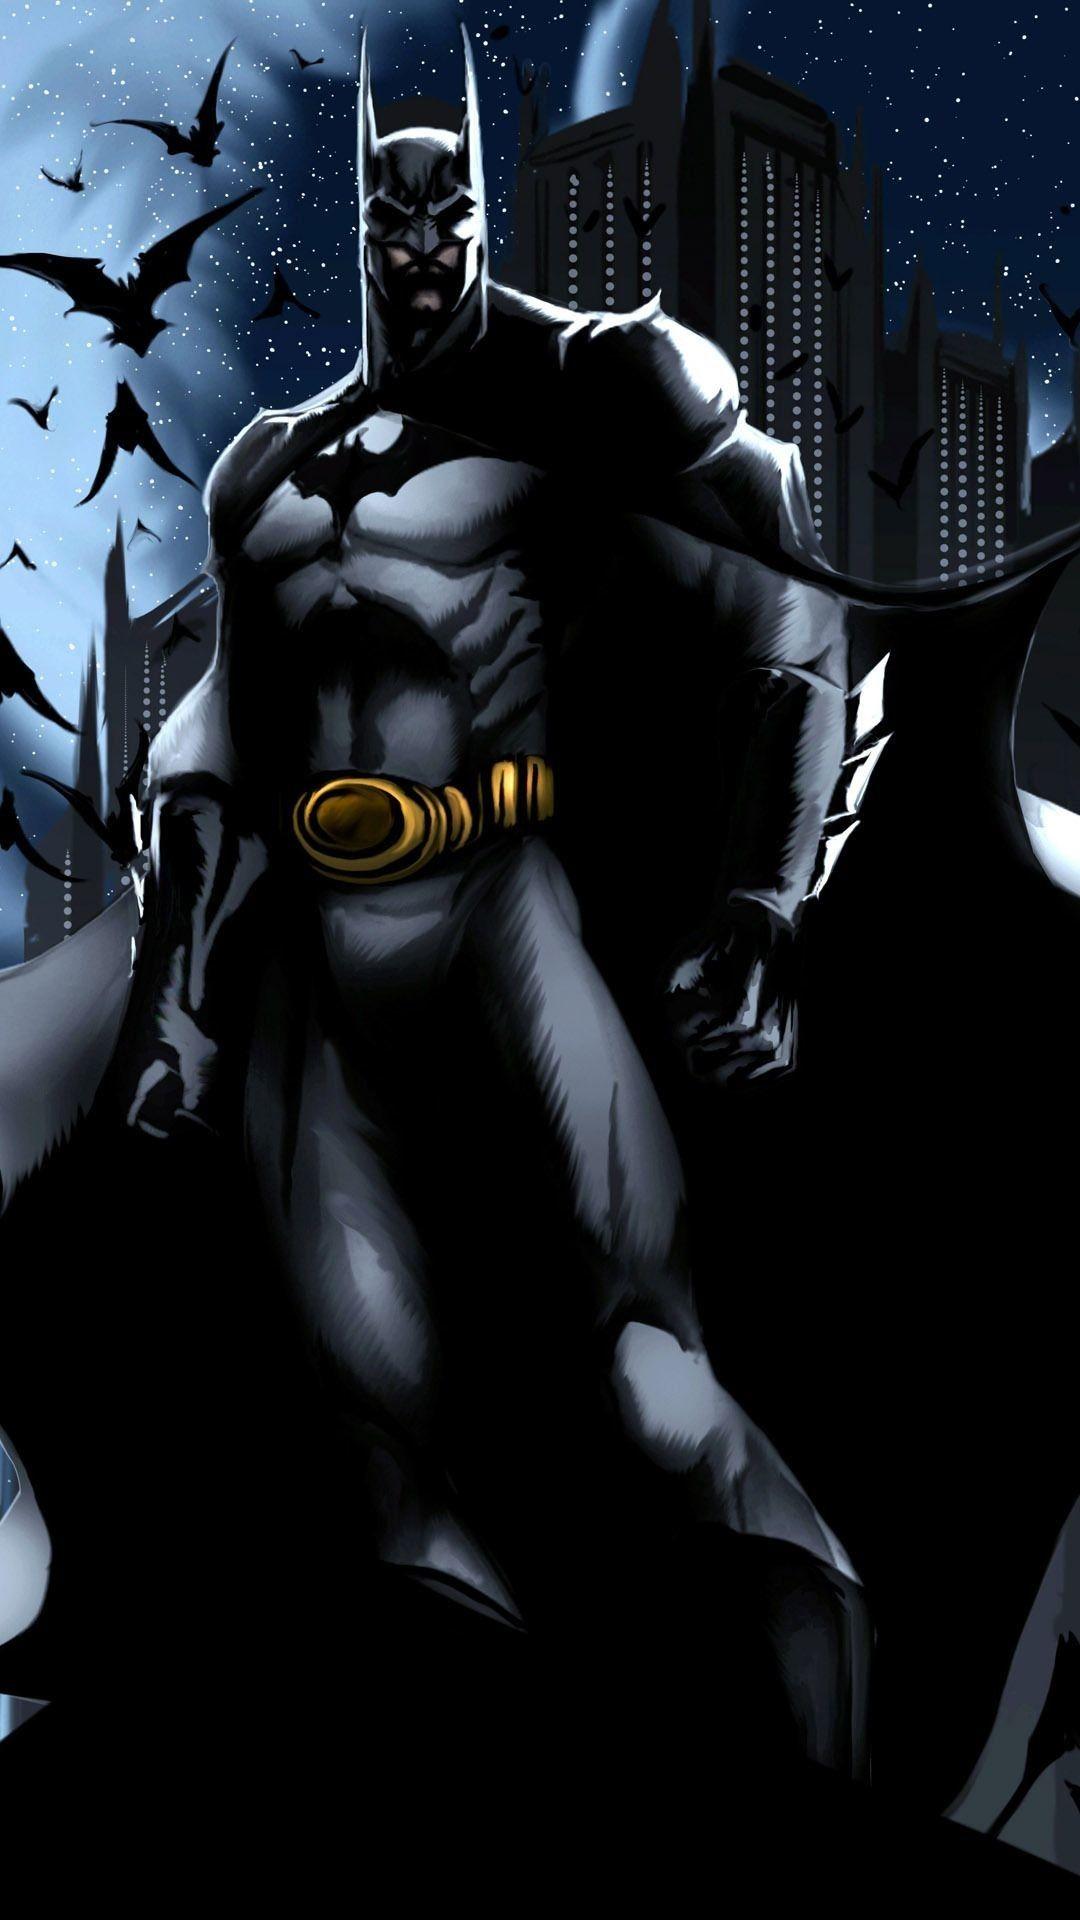 75 Batman Cartoon Wallpapers On Wallpaperplay Pertaining To Elegant Batman Cartoon Phone Wallpaper In 2020 Batman Cartoon Batman Pictures Batman Wallpaper